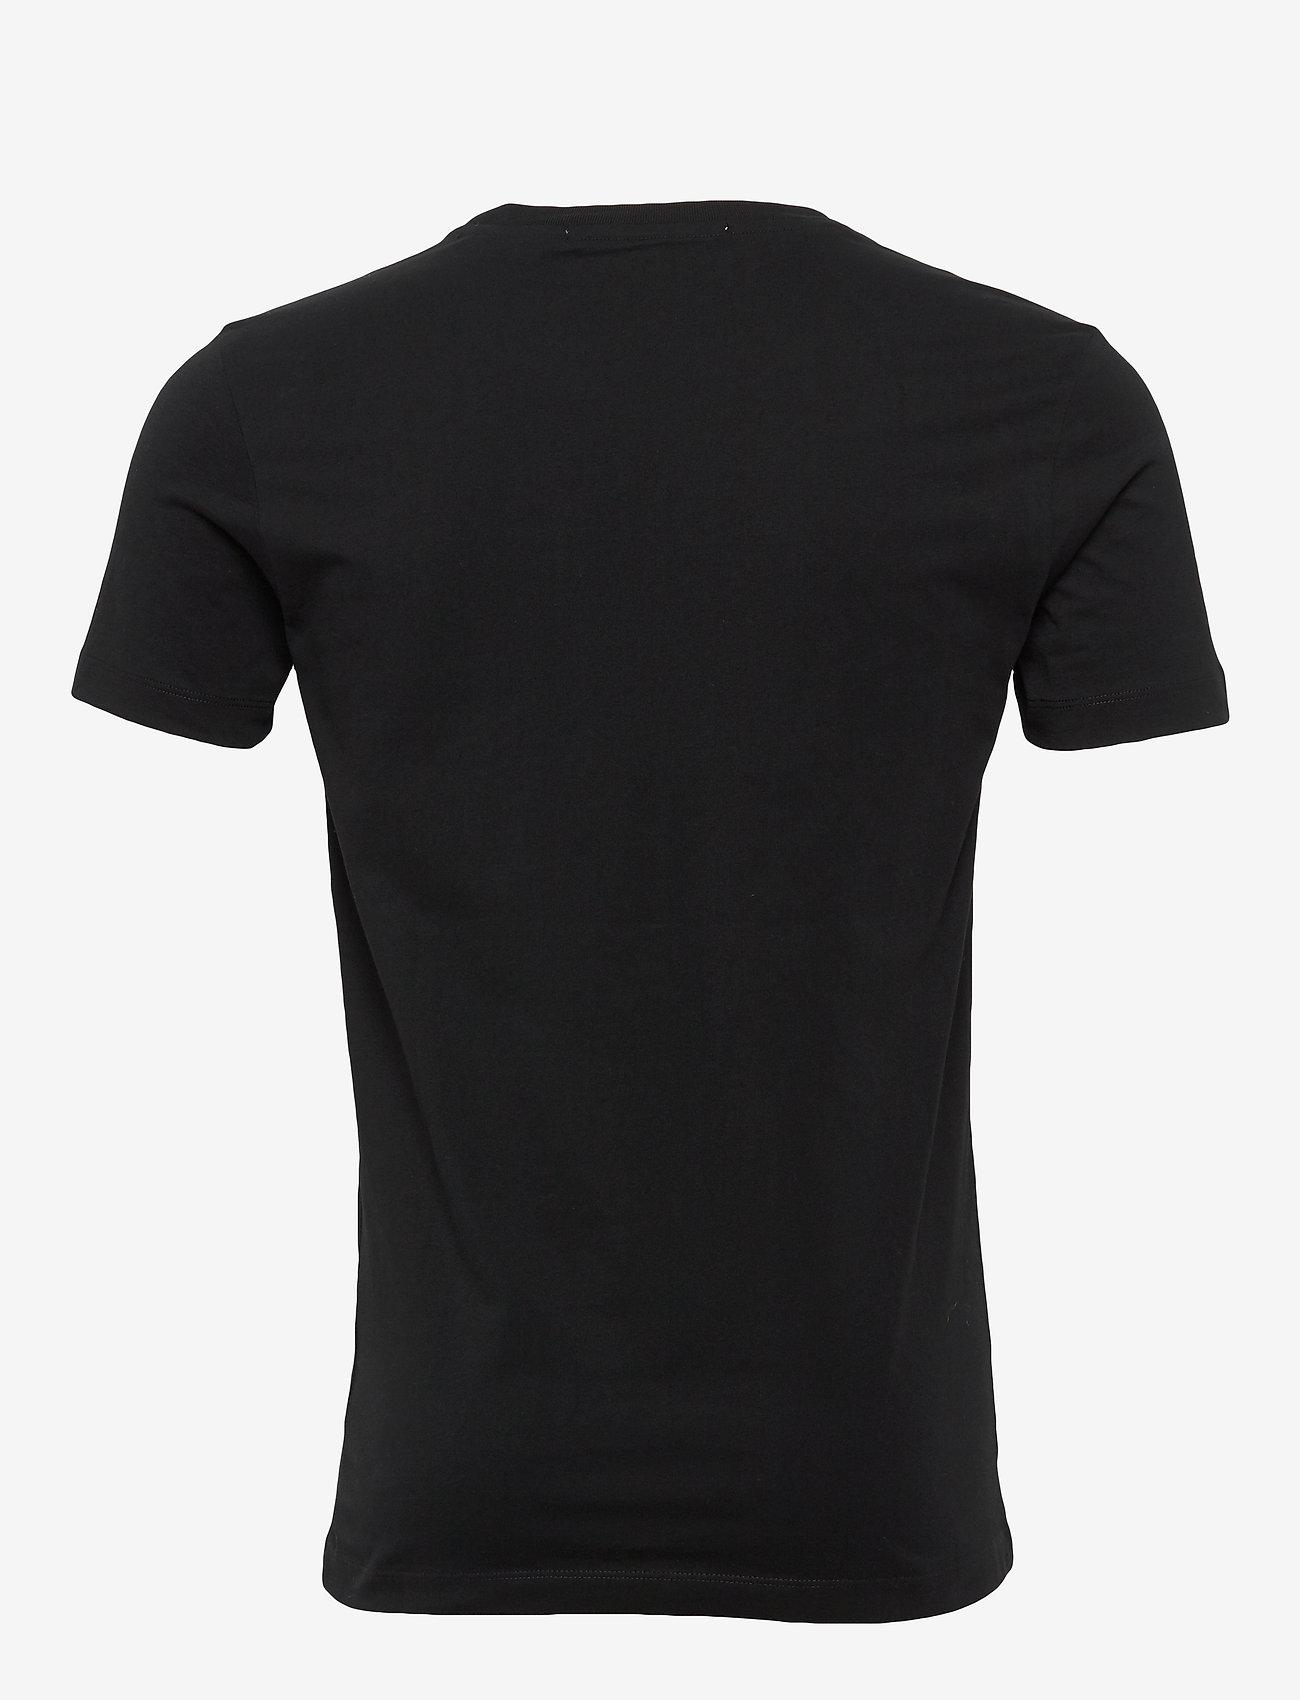 3d Monogram Slim Tee (Ck Black) (38.94 €) - Calvin Klein Jeans lFmvVPkn